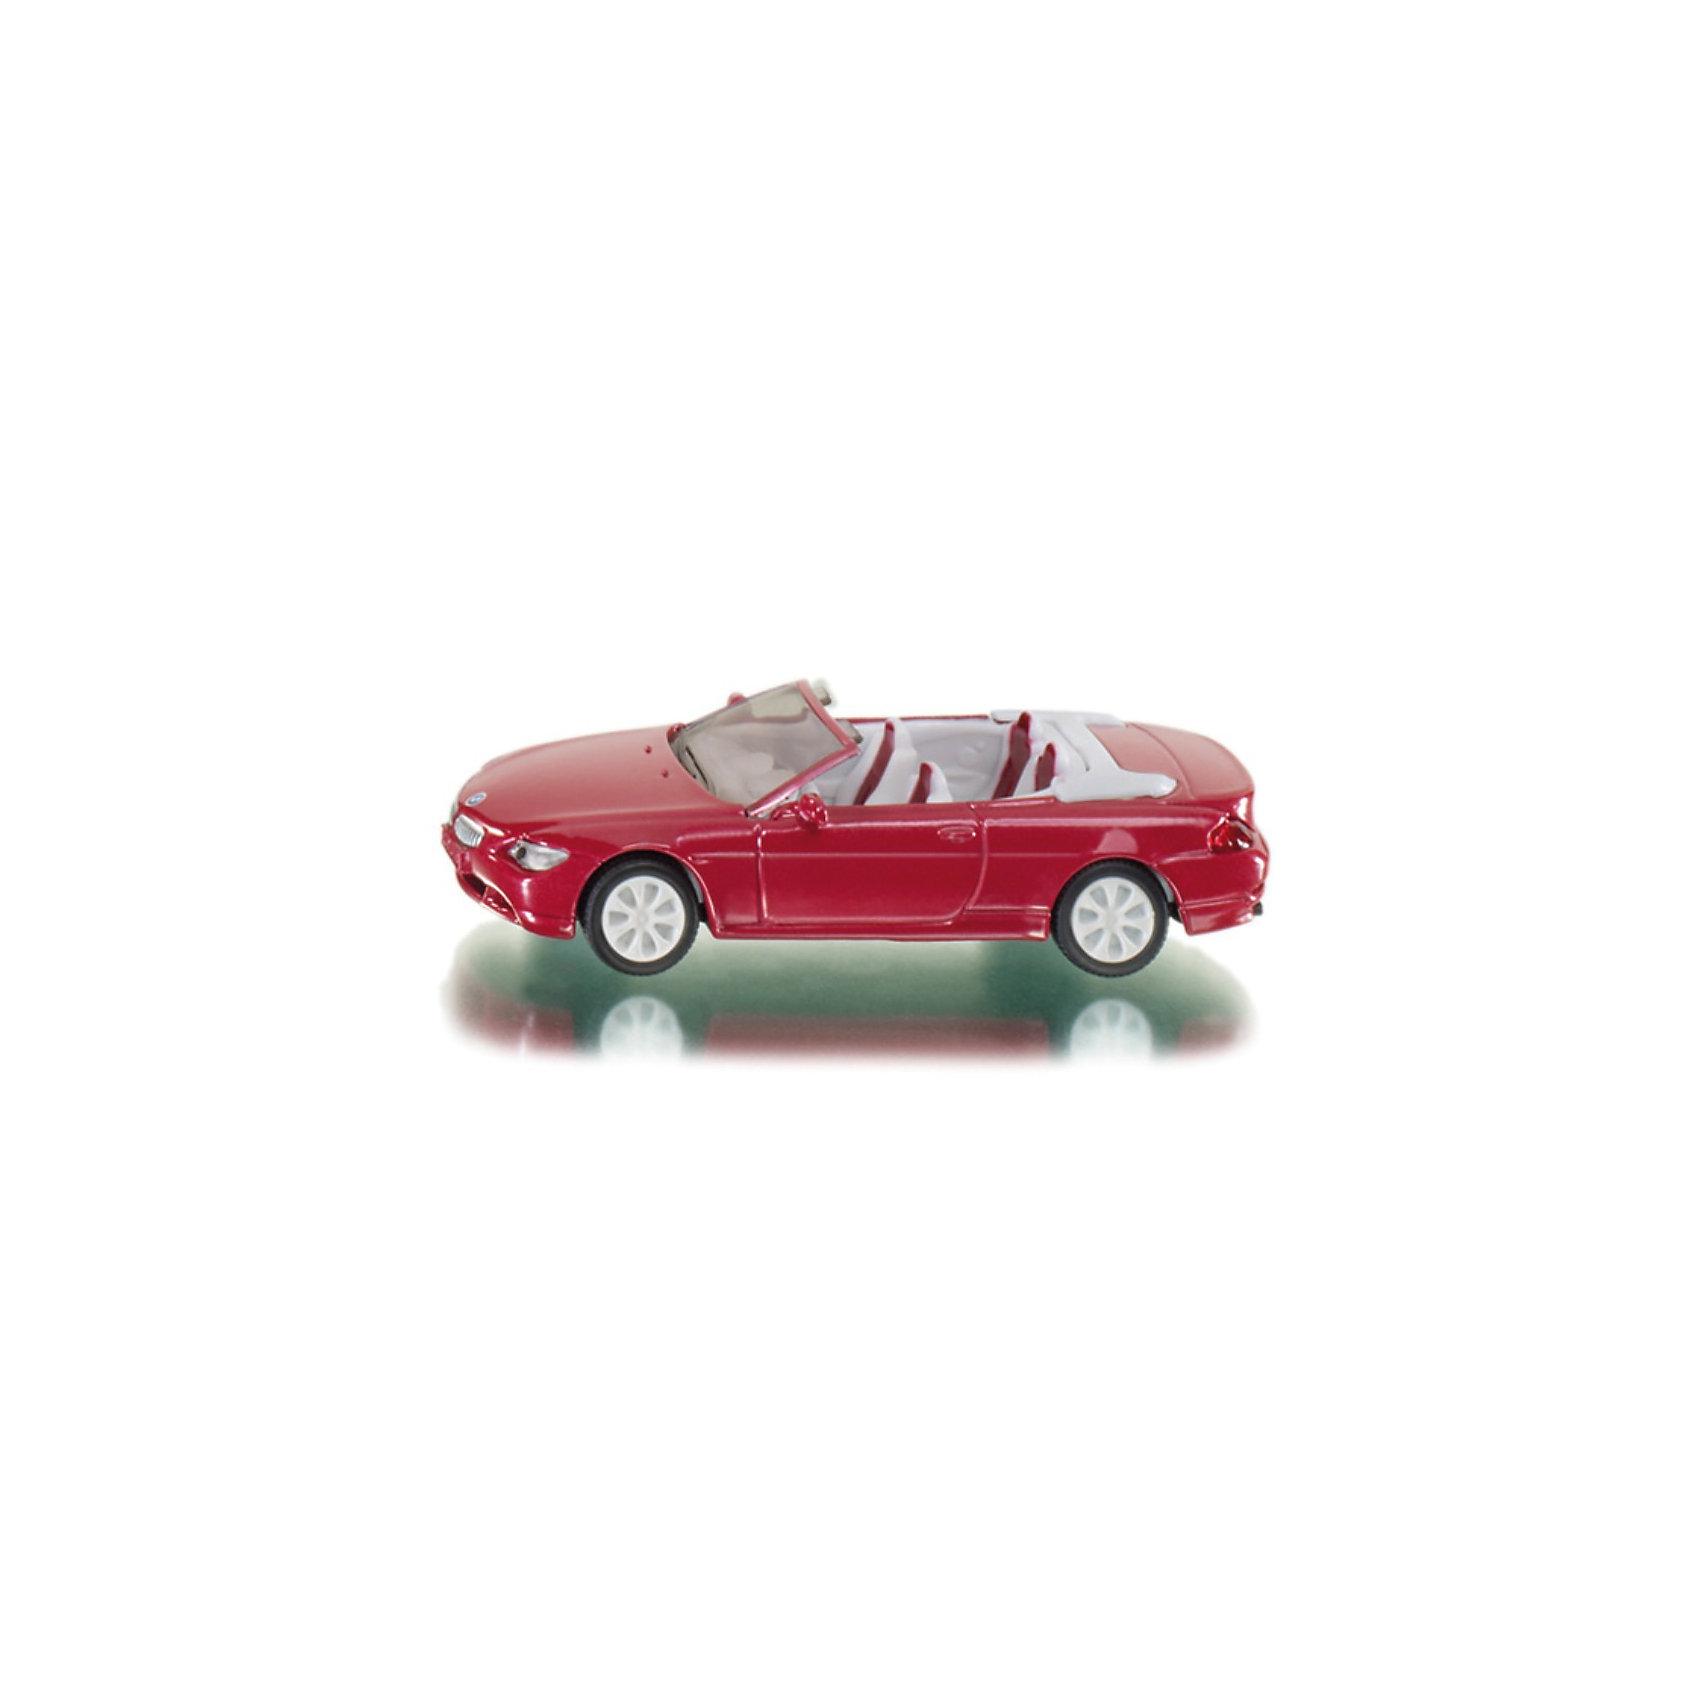 SIKU SIKU 1007 BMW 645i Cabrio siku siku 1007 bmw 645i cabrio